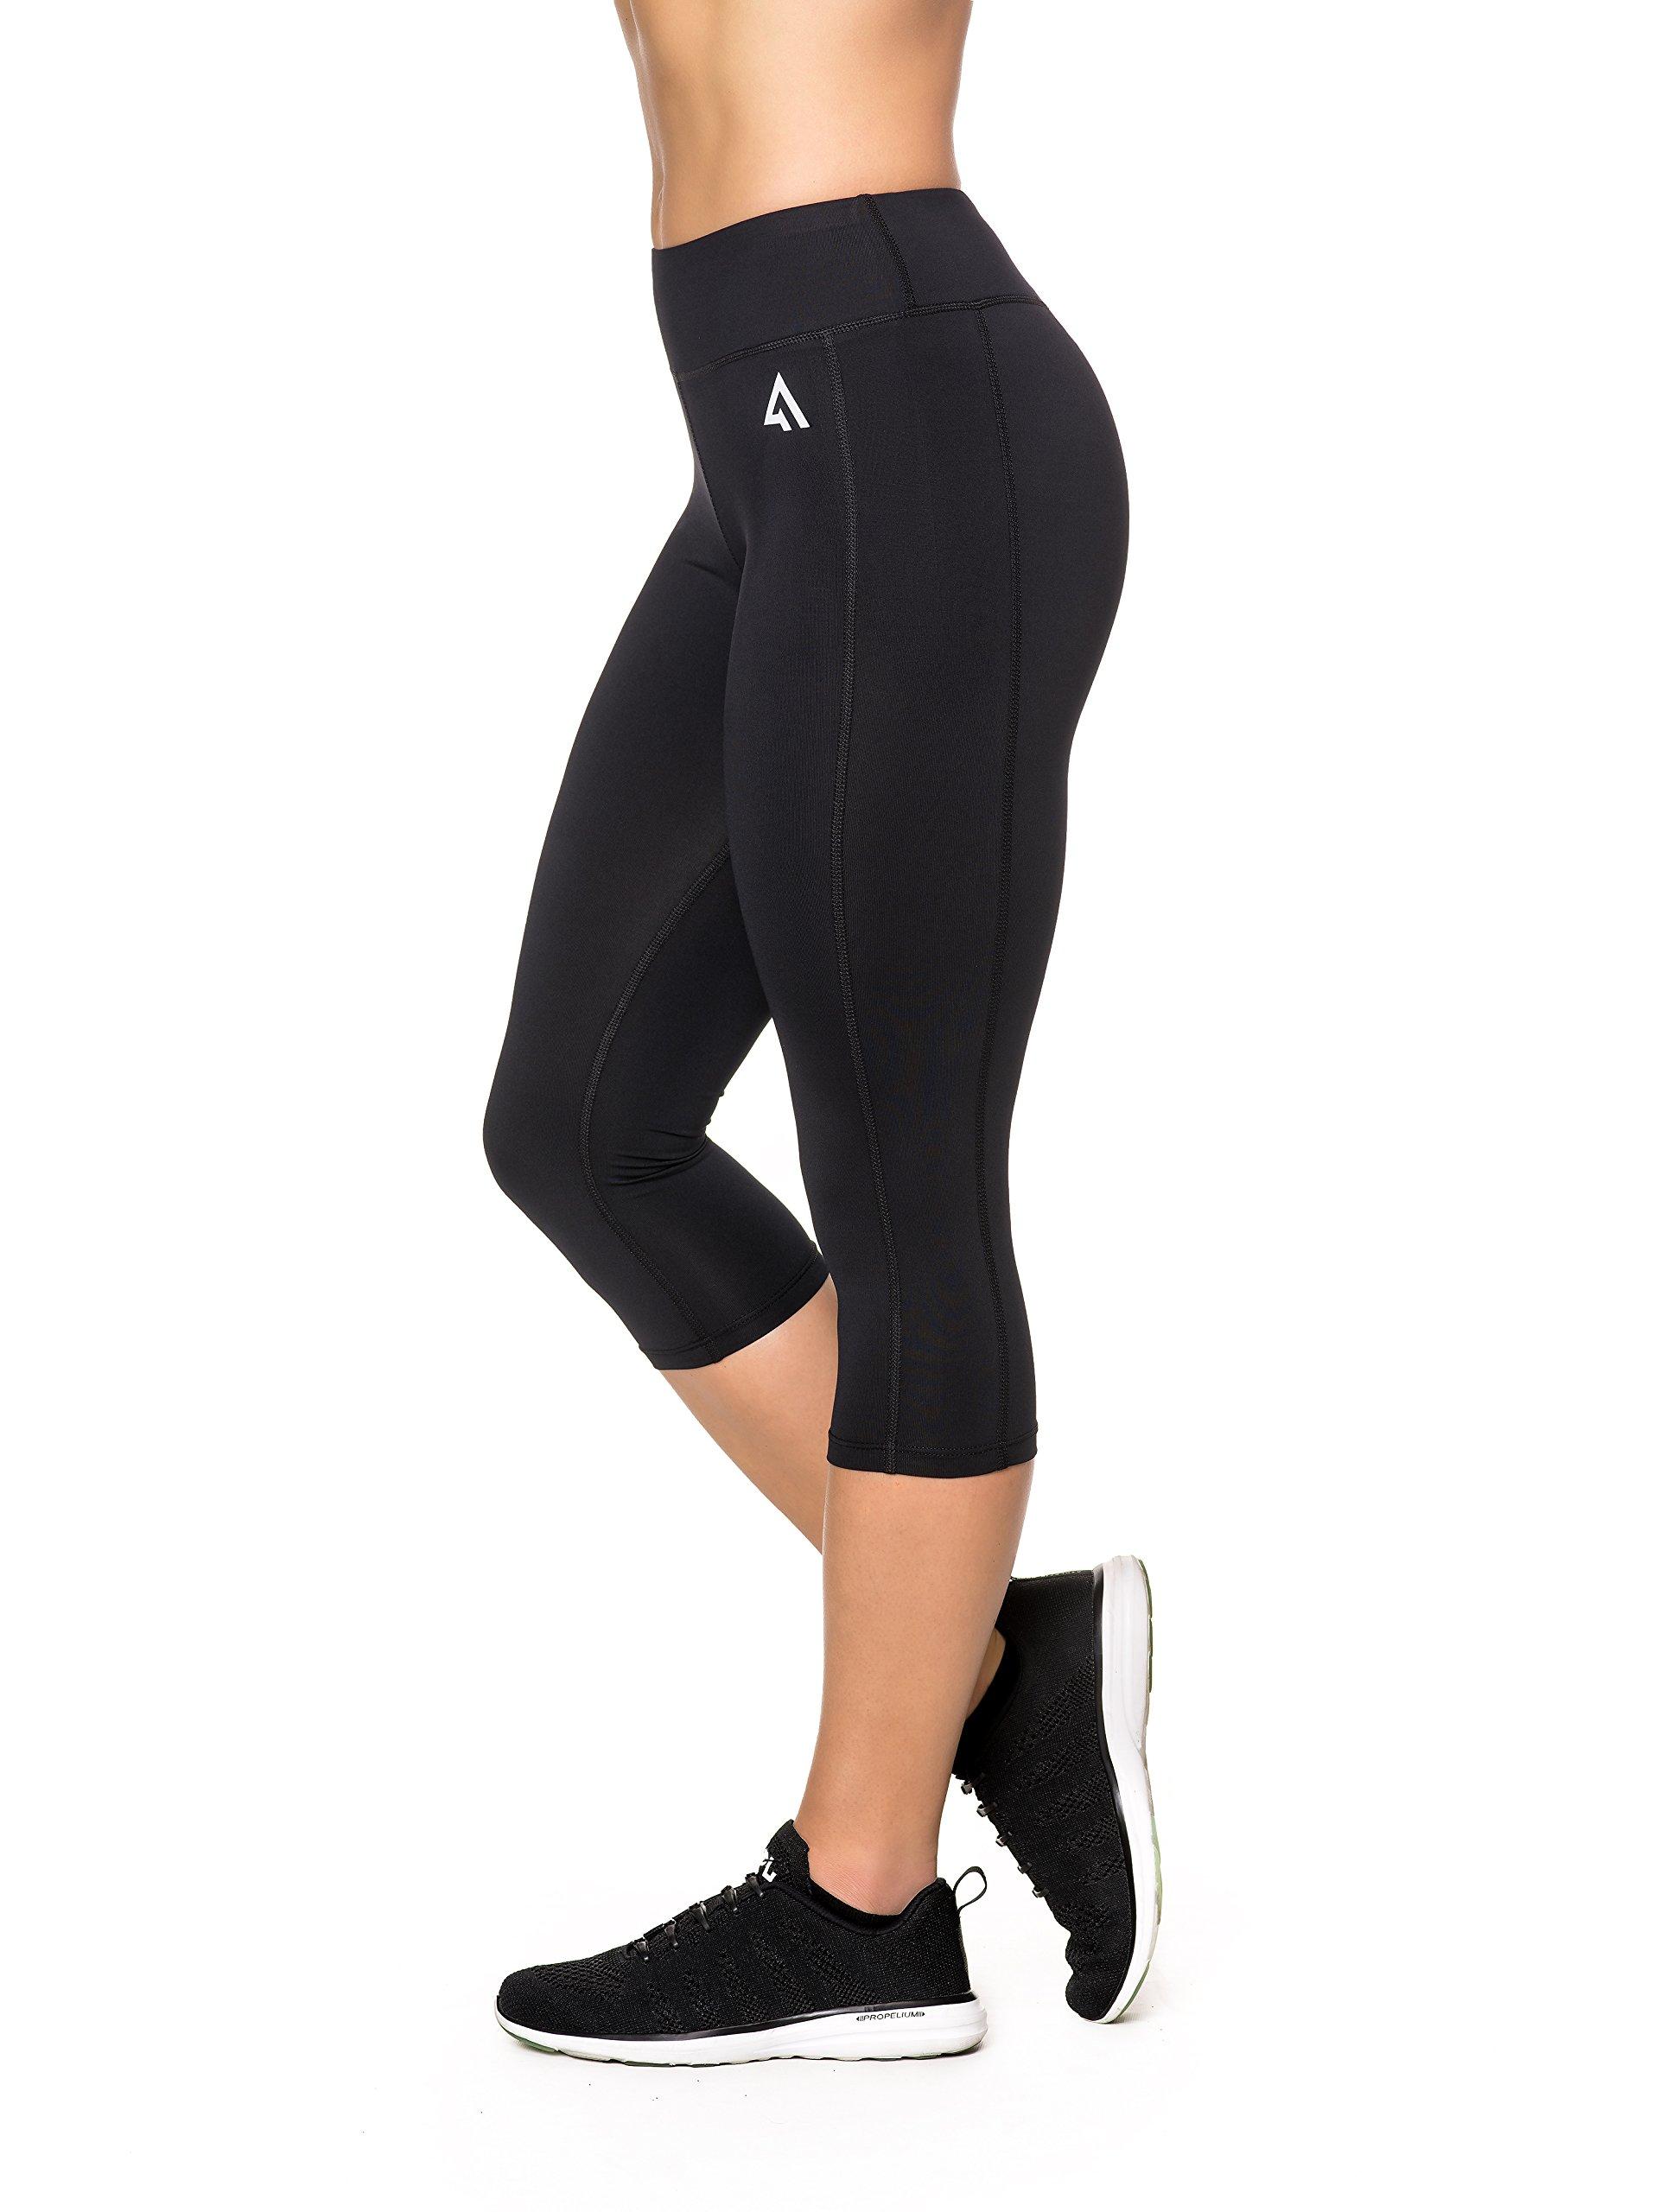 Active1st Women's Yoga Pants Sport Leggings – High Waist, Capri, Tagless